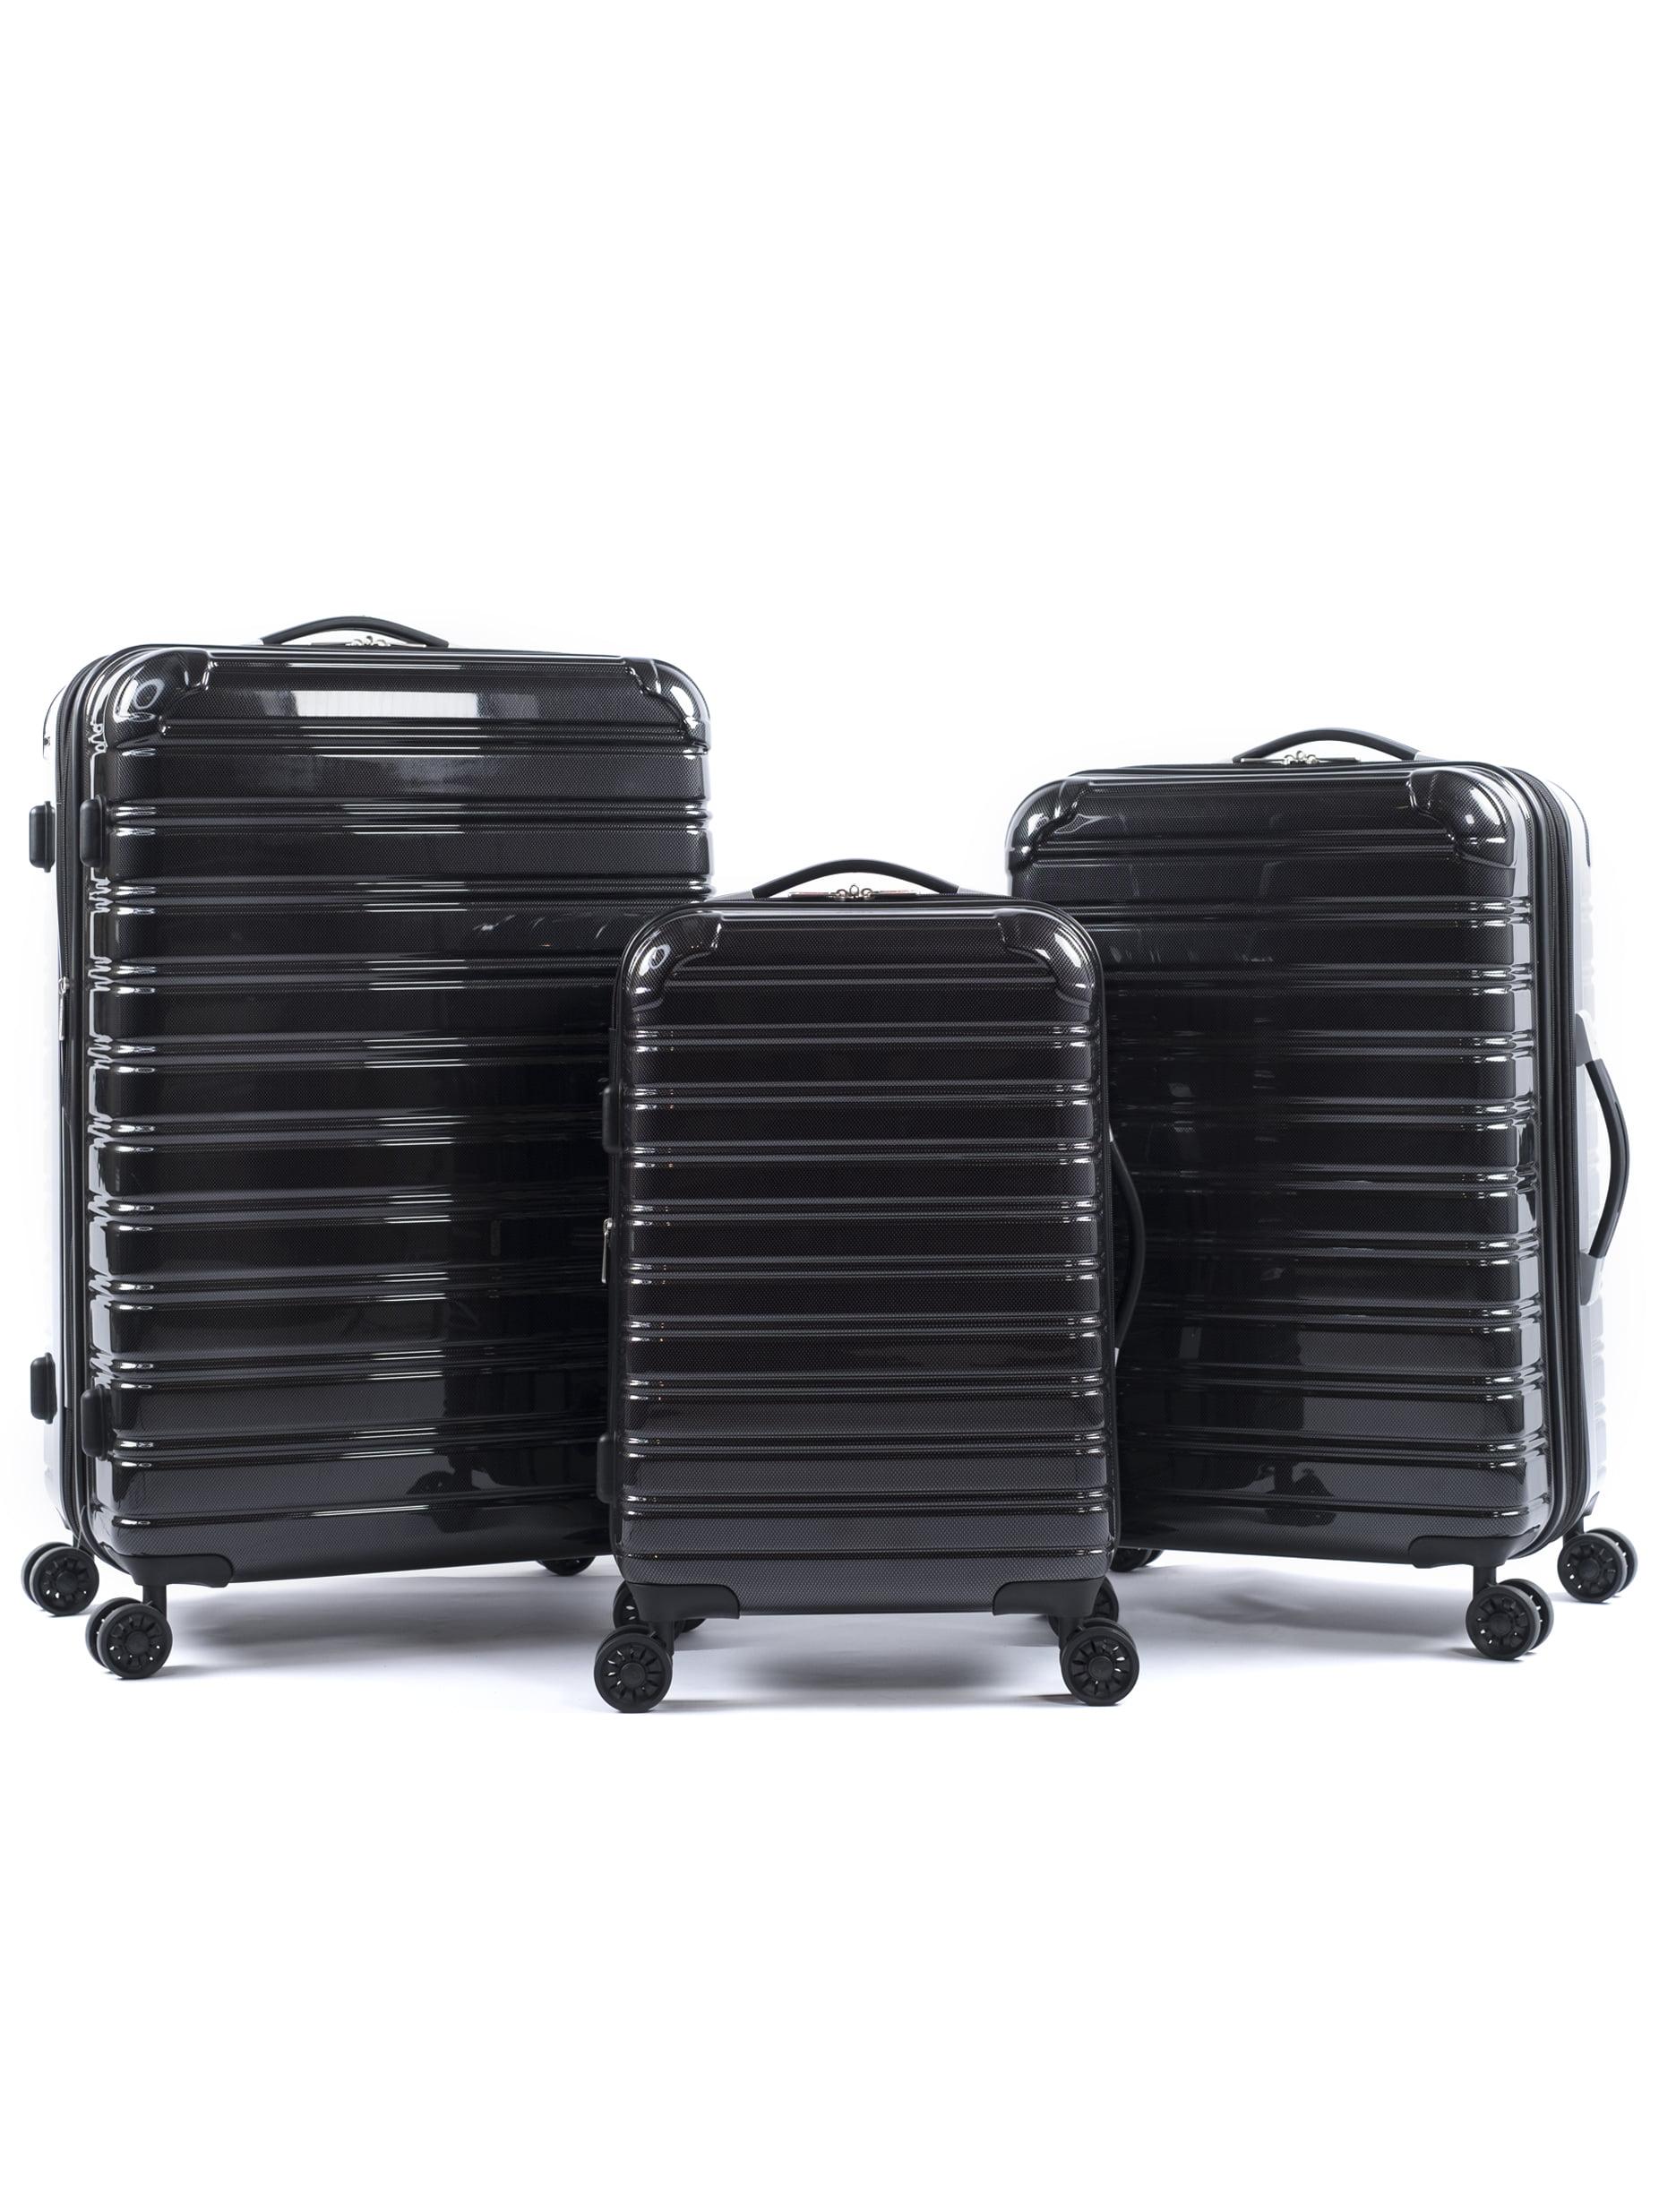 iFLY Hardside Fibertech Luggage 3 Piece Set, 20 Inch Carry-on, 24 Inch Checked Luggage and 28 Inch Checked Luggage, Black